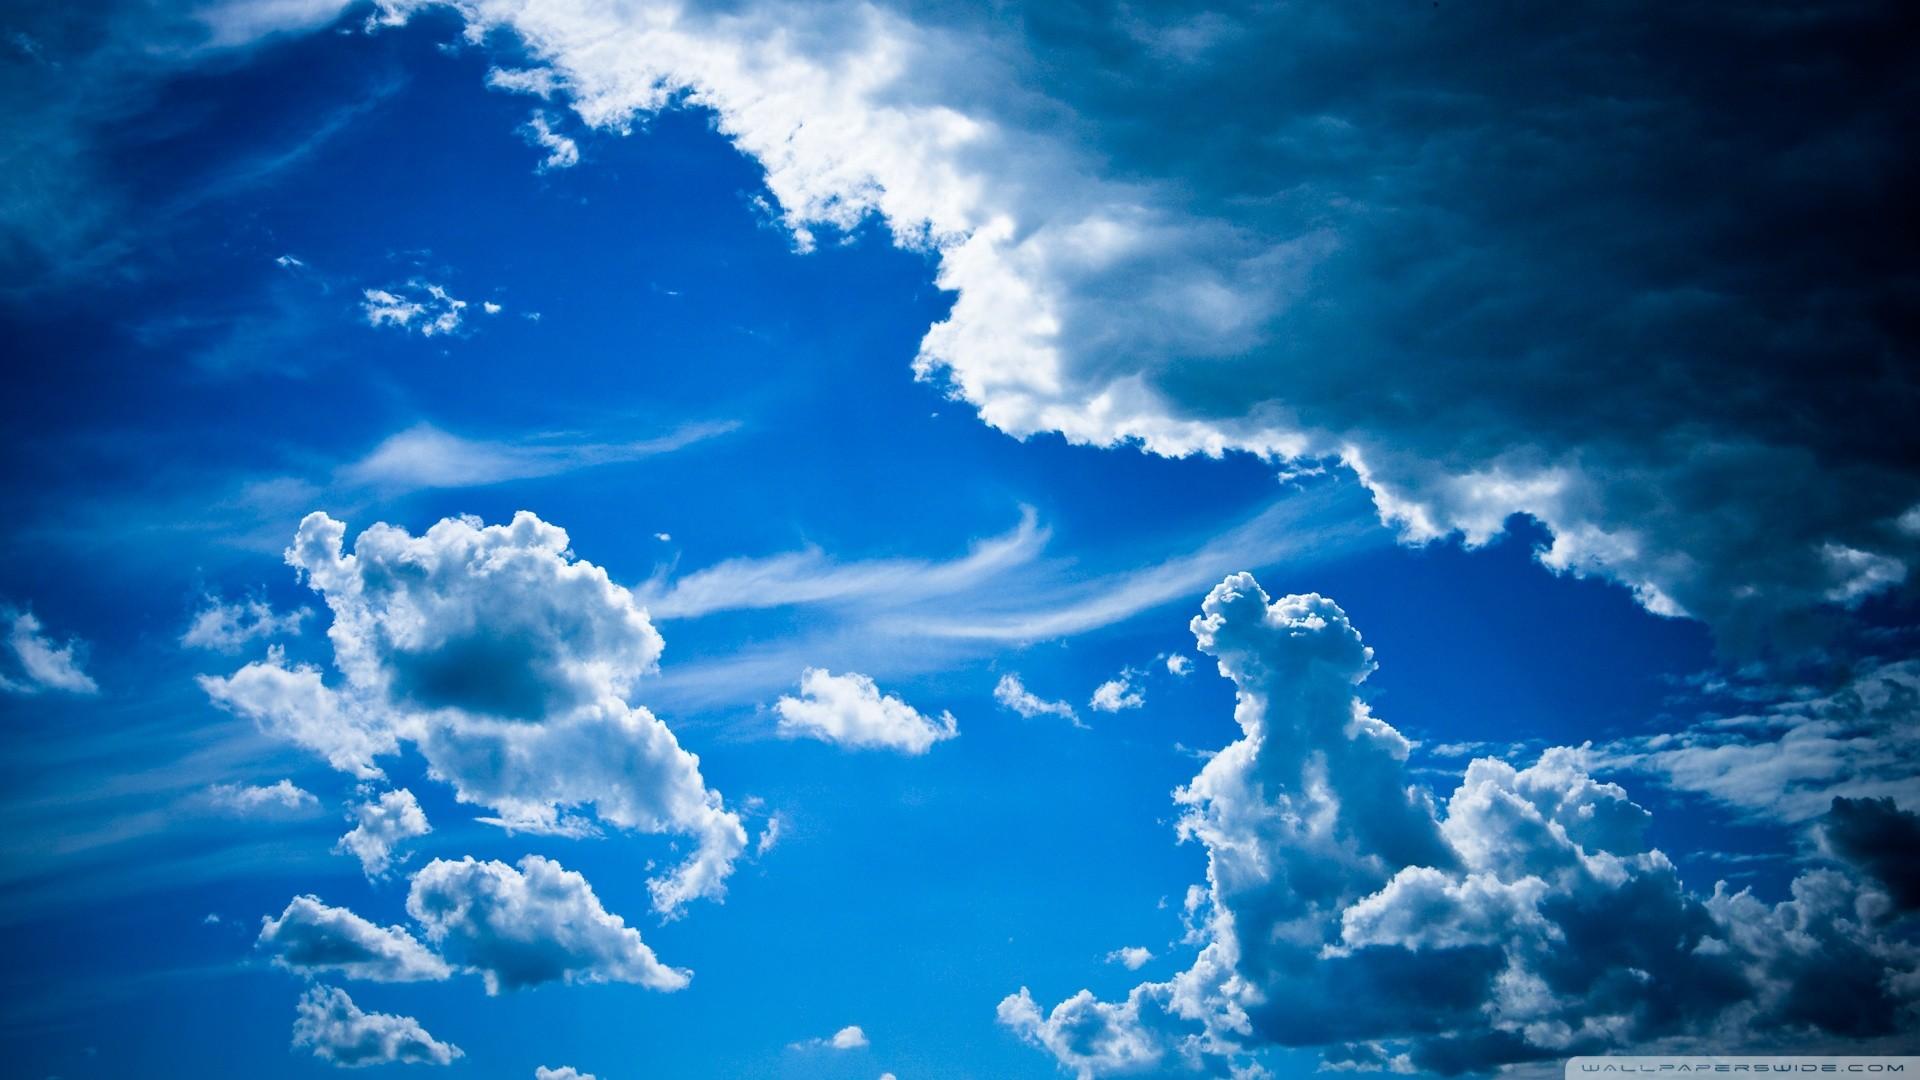 Res: 1920x1080, Blue Clouds Wallpaper  Blue Clouds